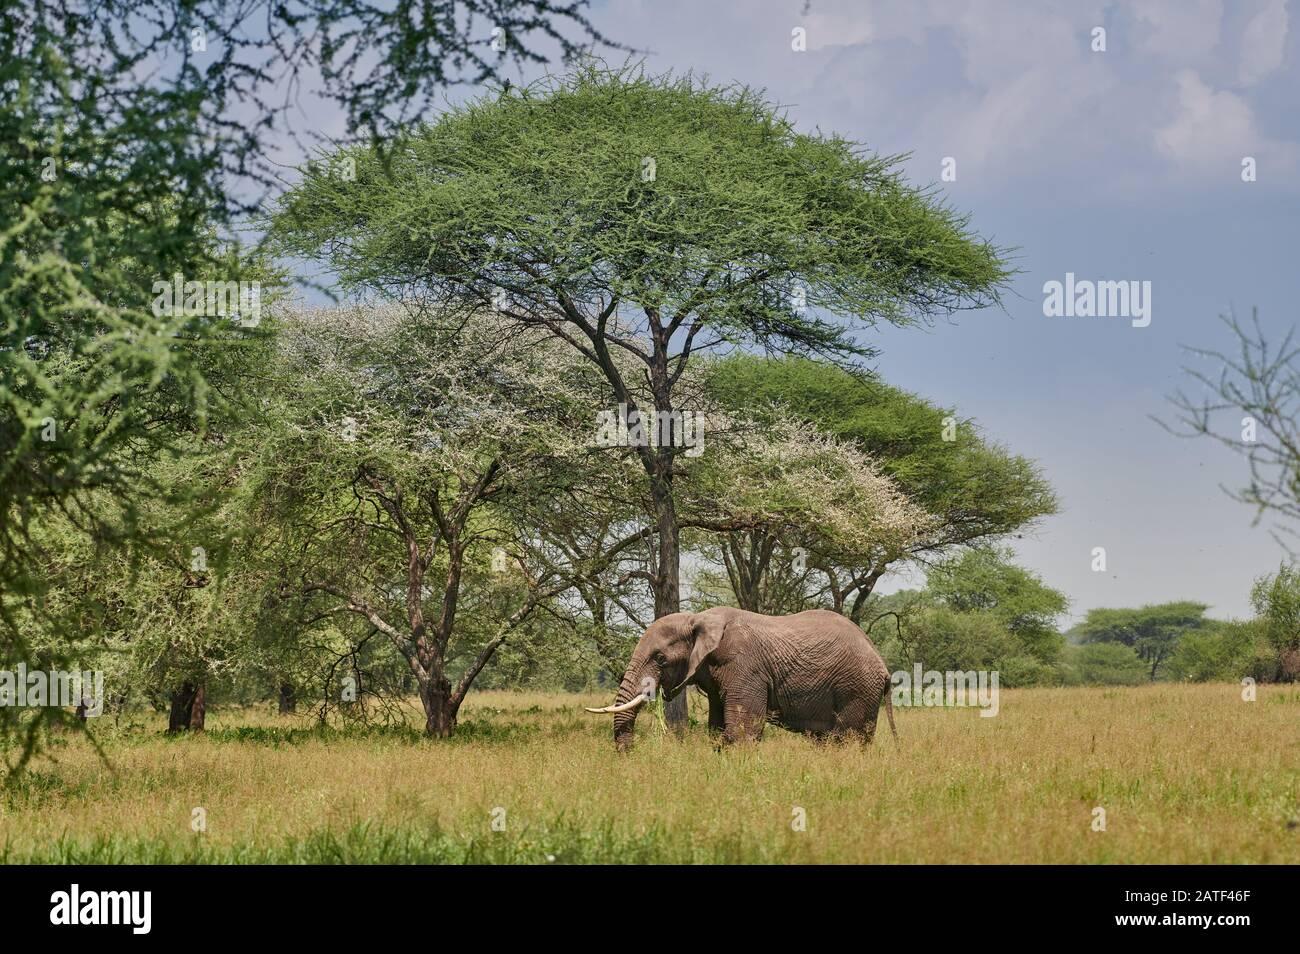 African bush elephant between acacias, Loxodonta africana, in Tarangire National Park, Tanzania, Africa Stock Photo